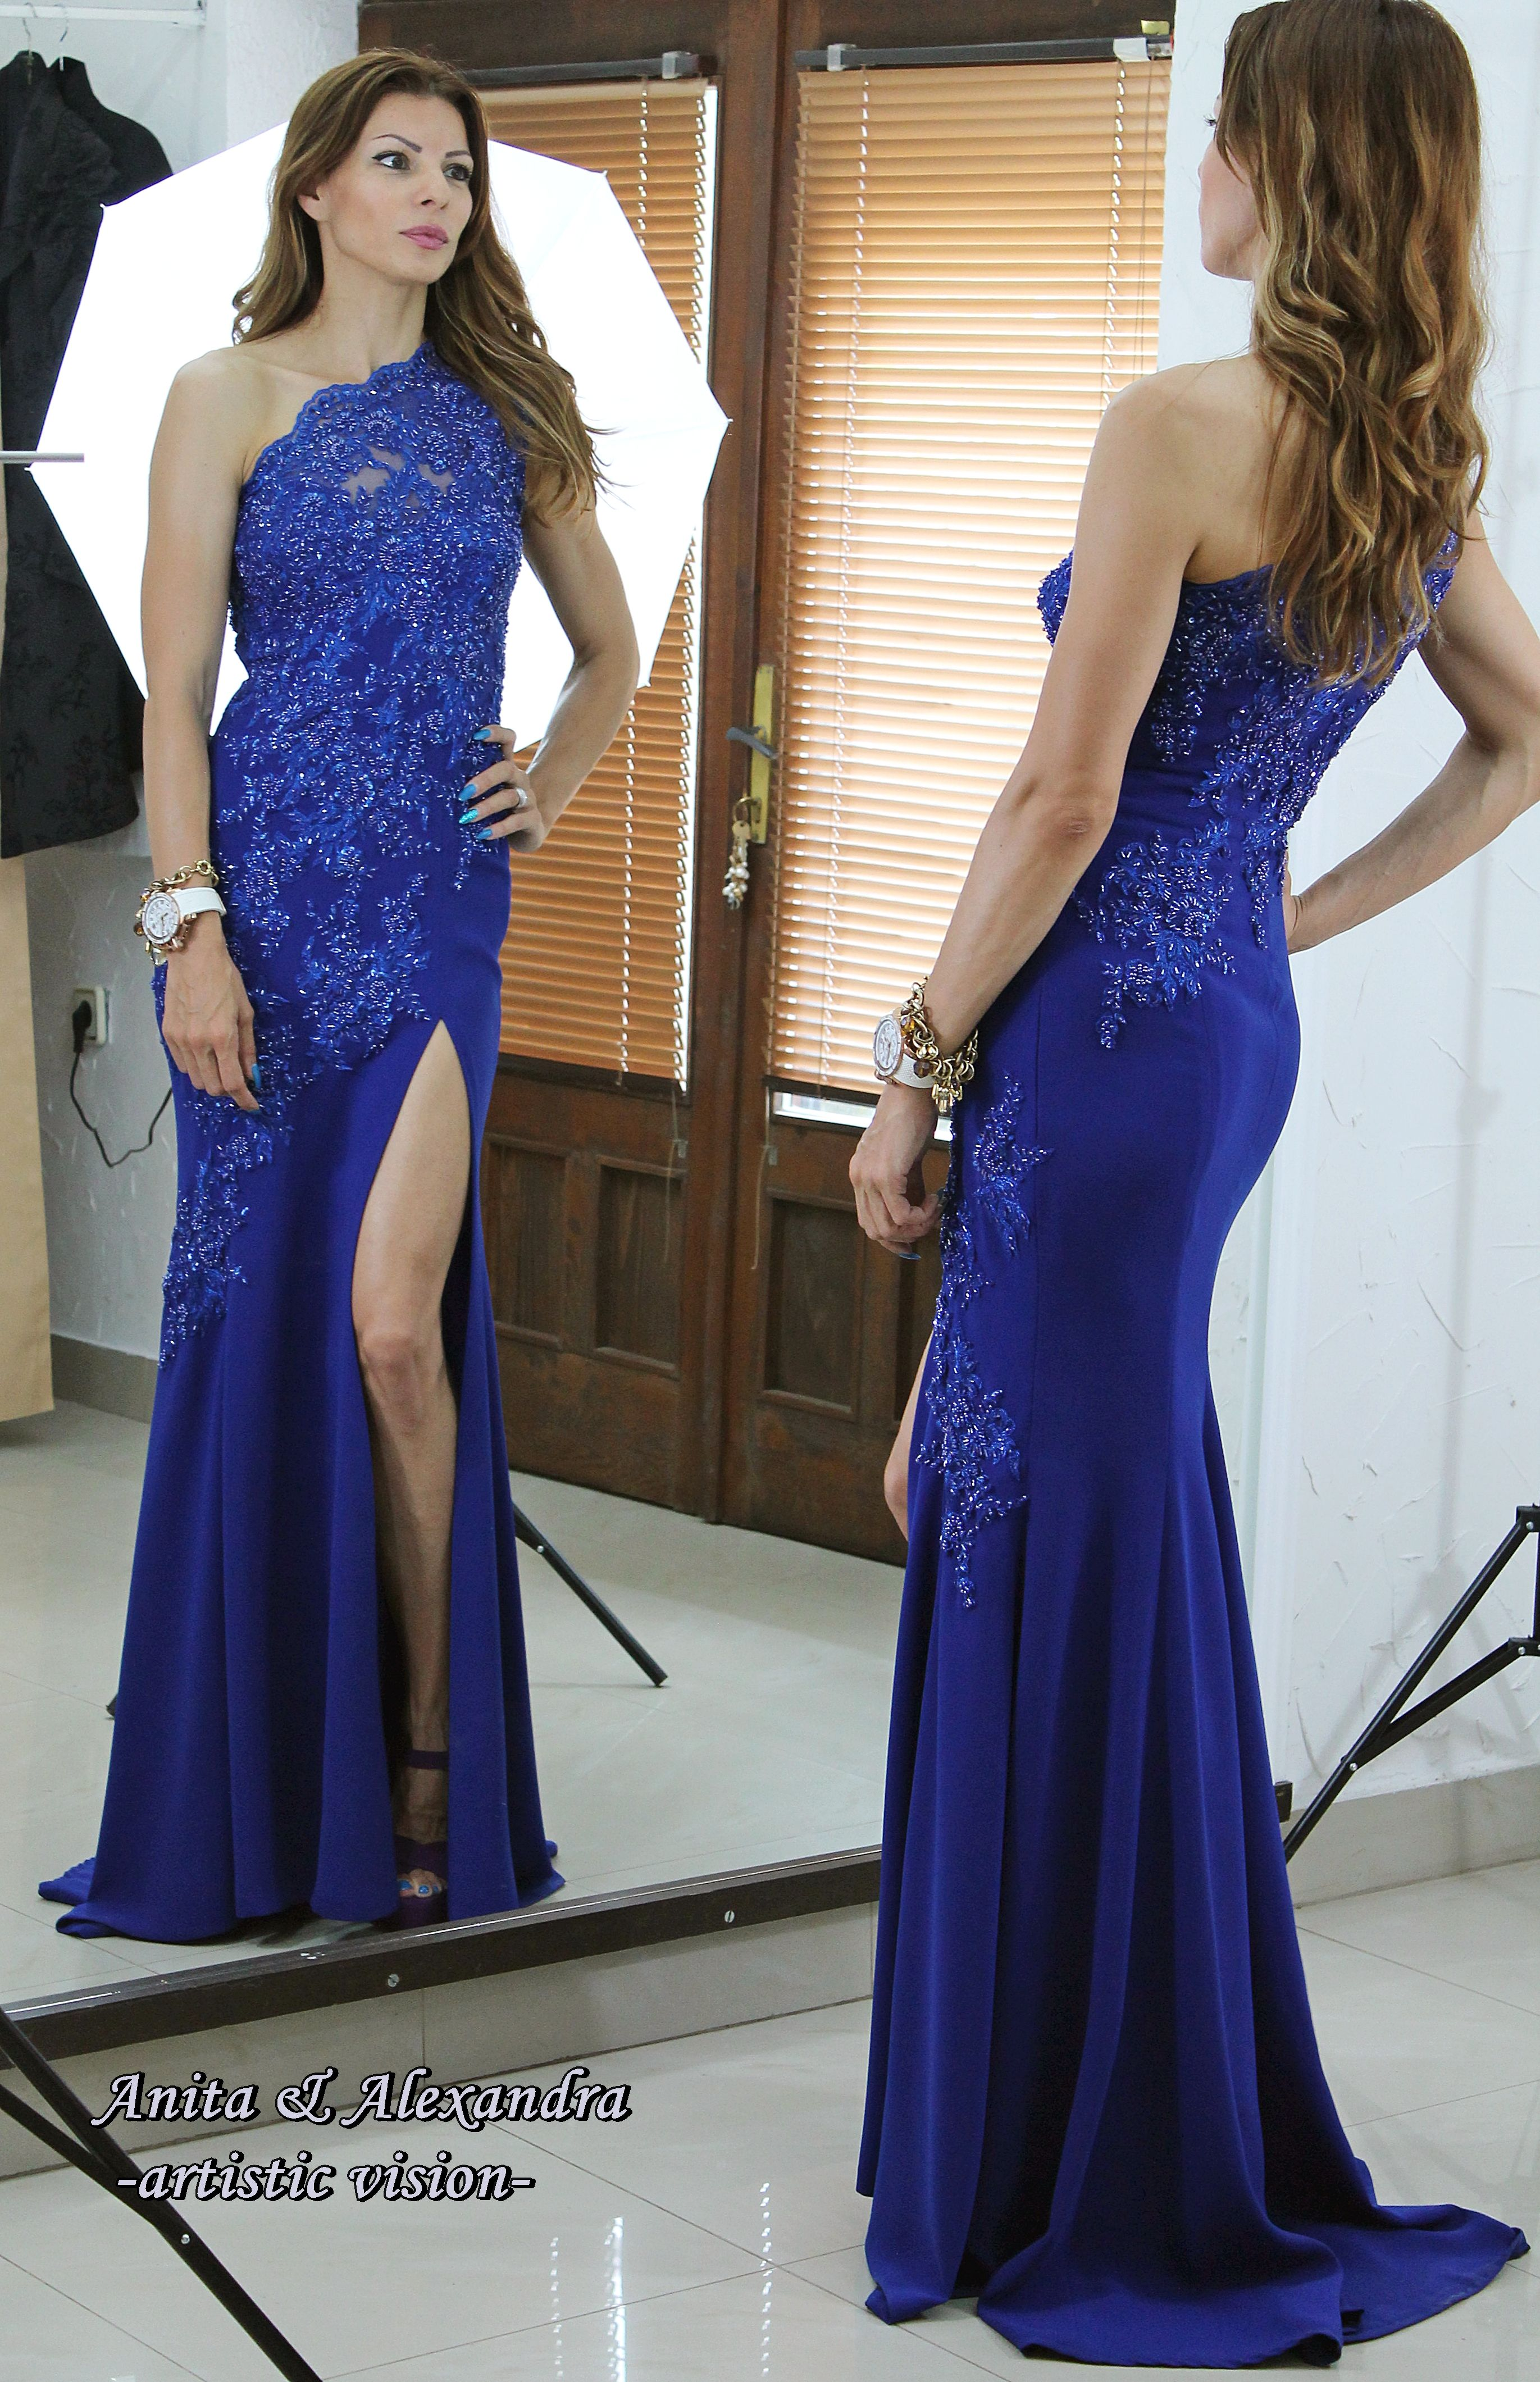 Anita u alexandra artistic vision royaldress royal dress